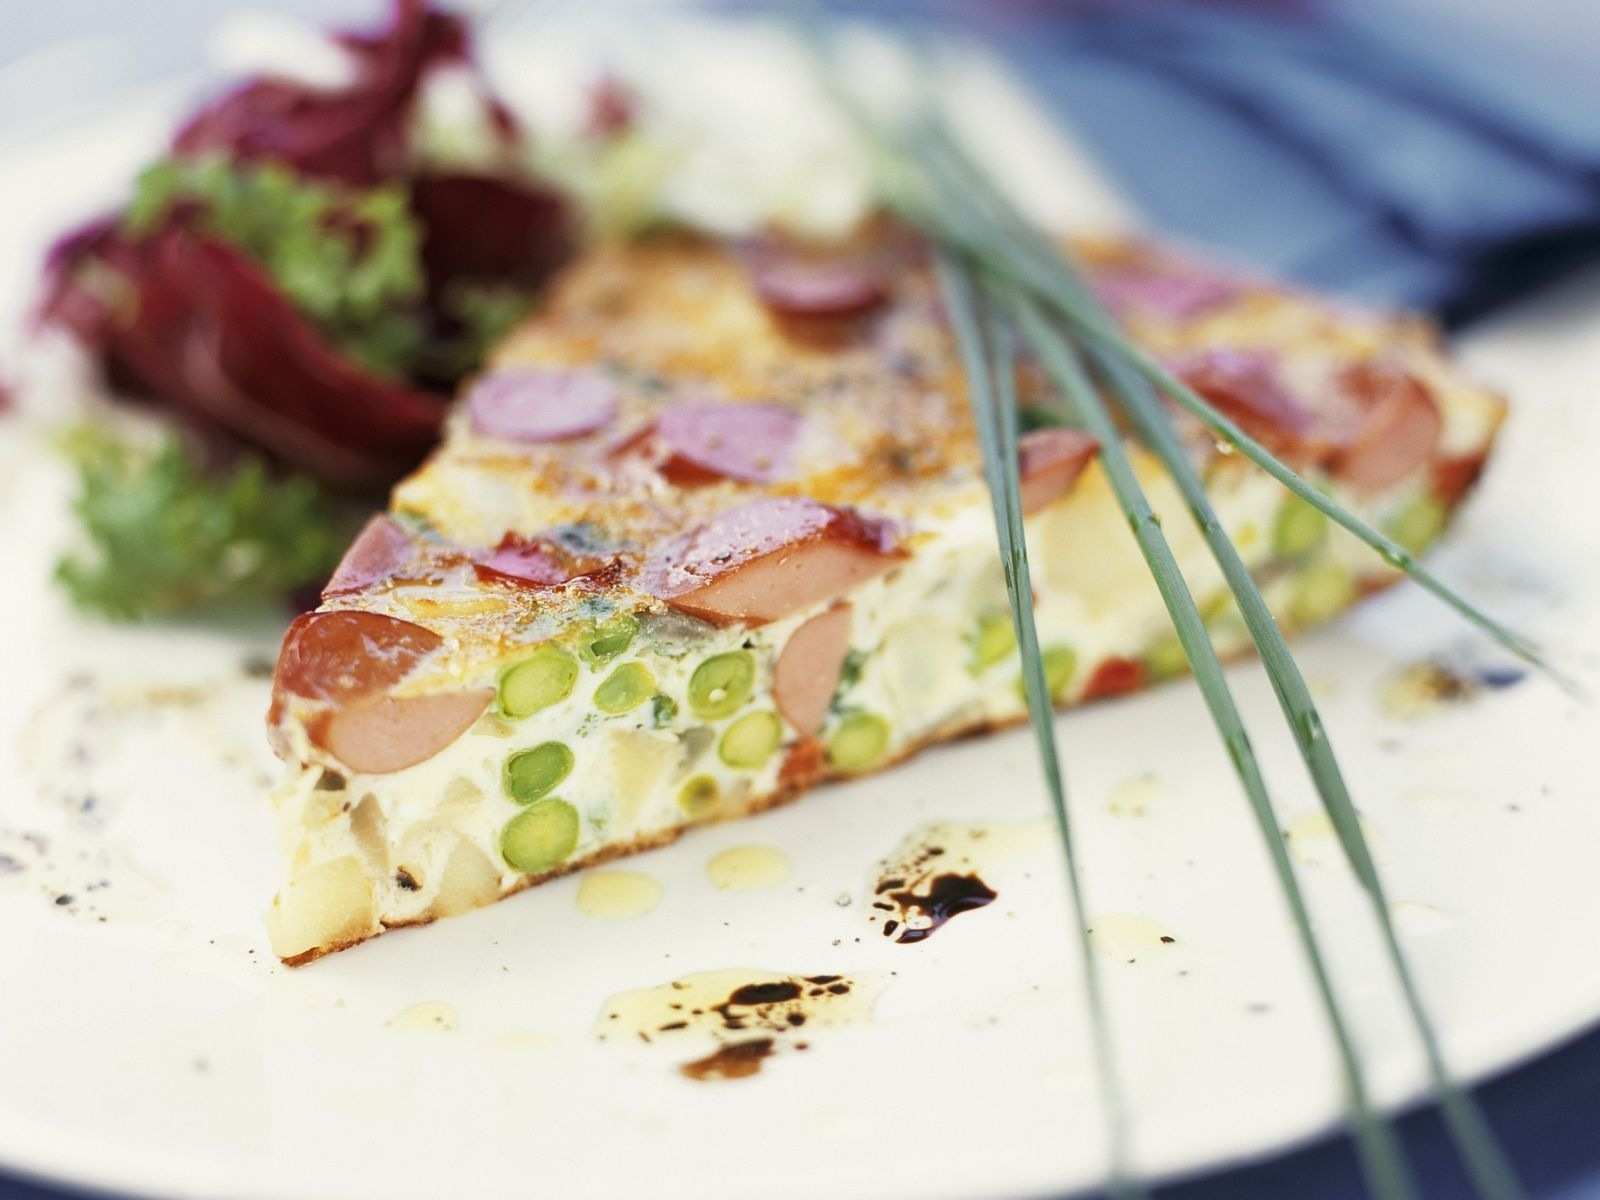 Würstchen-Spargel-Tarte mit Salat | Zeit: 1 Std. 15 Min. | http://eatsmarter.de/rezepte/wuerstchen-spargel-tarte-mit-salat